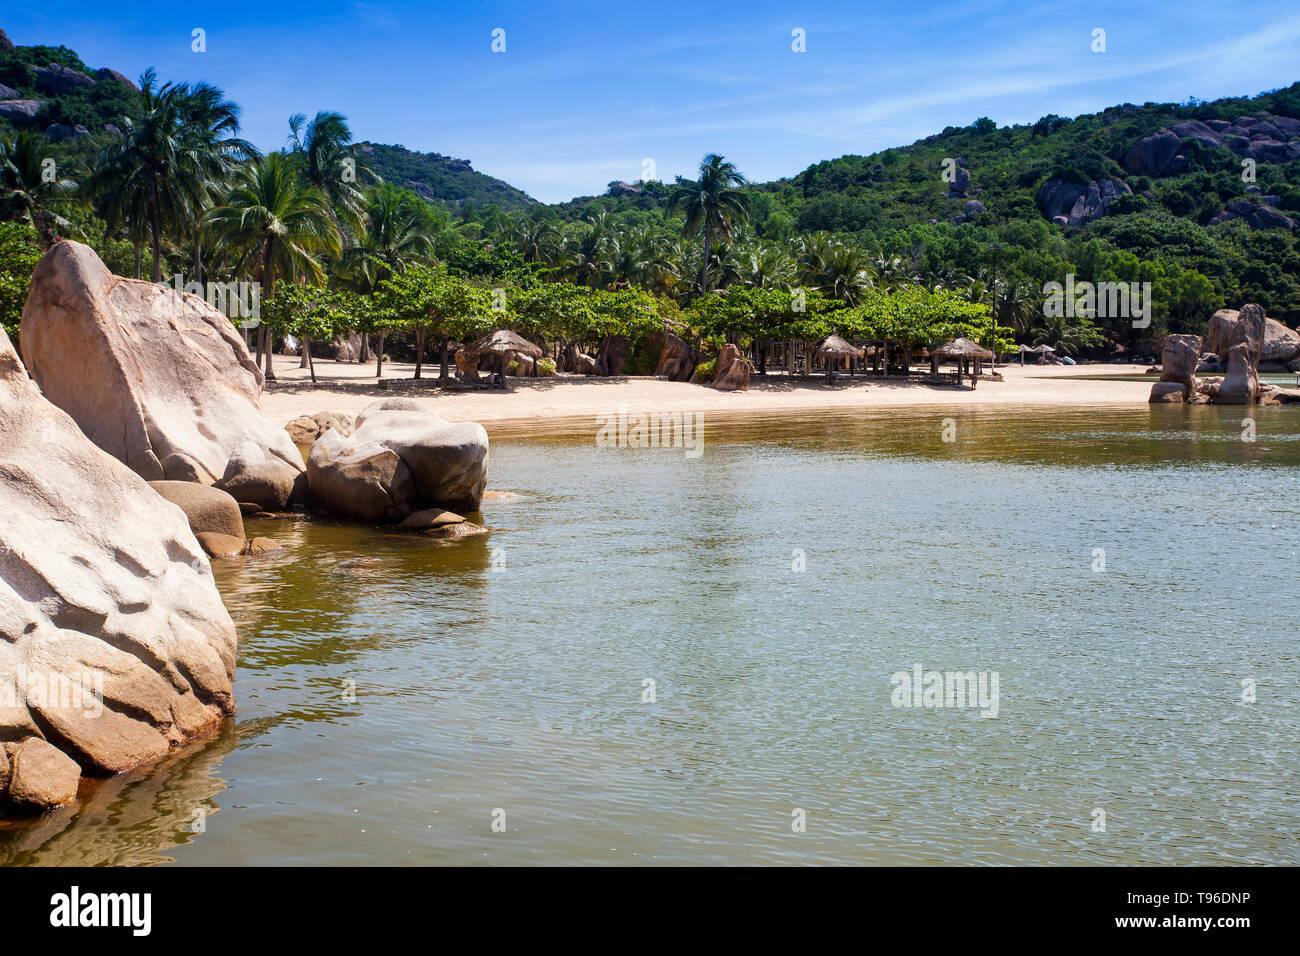 The beach from the Small bungalow resort Ngoc Suong, in Cam Ranh Bay,south china sea, Nha Trang, Vietnam, Asia - Stock Image